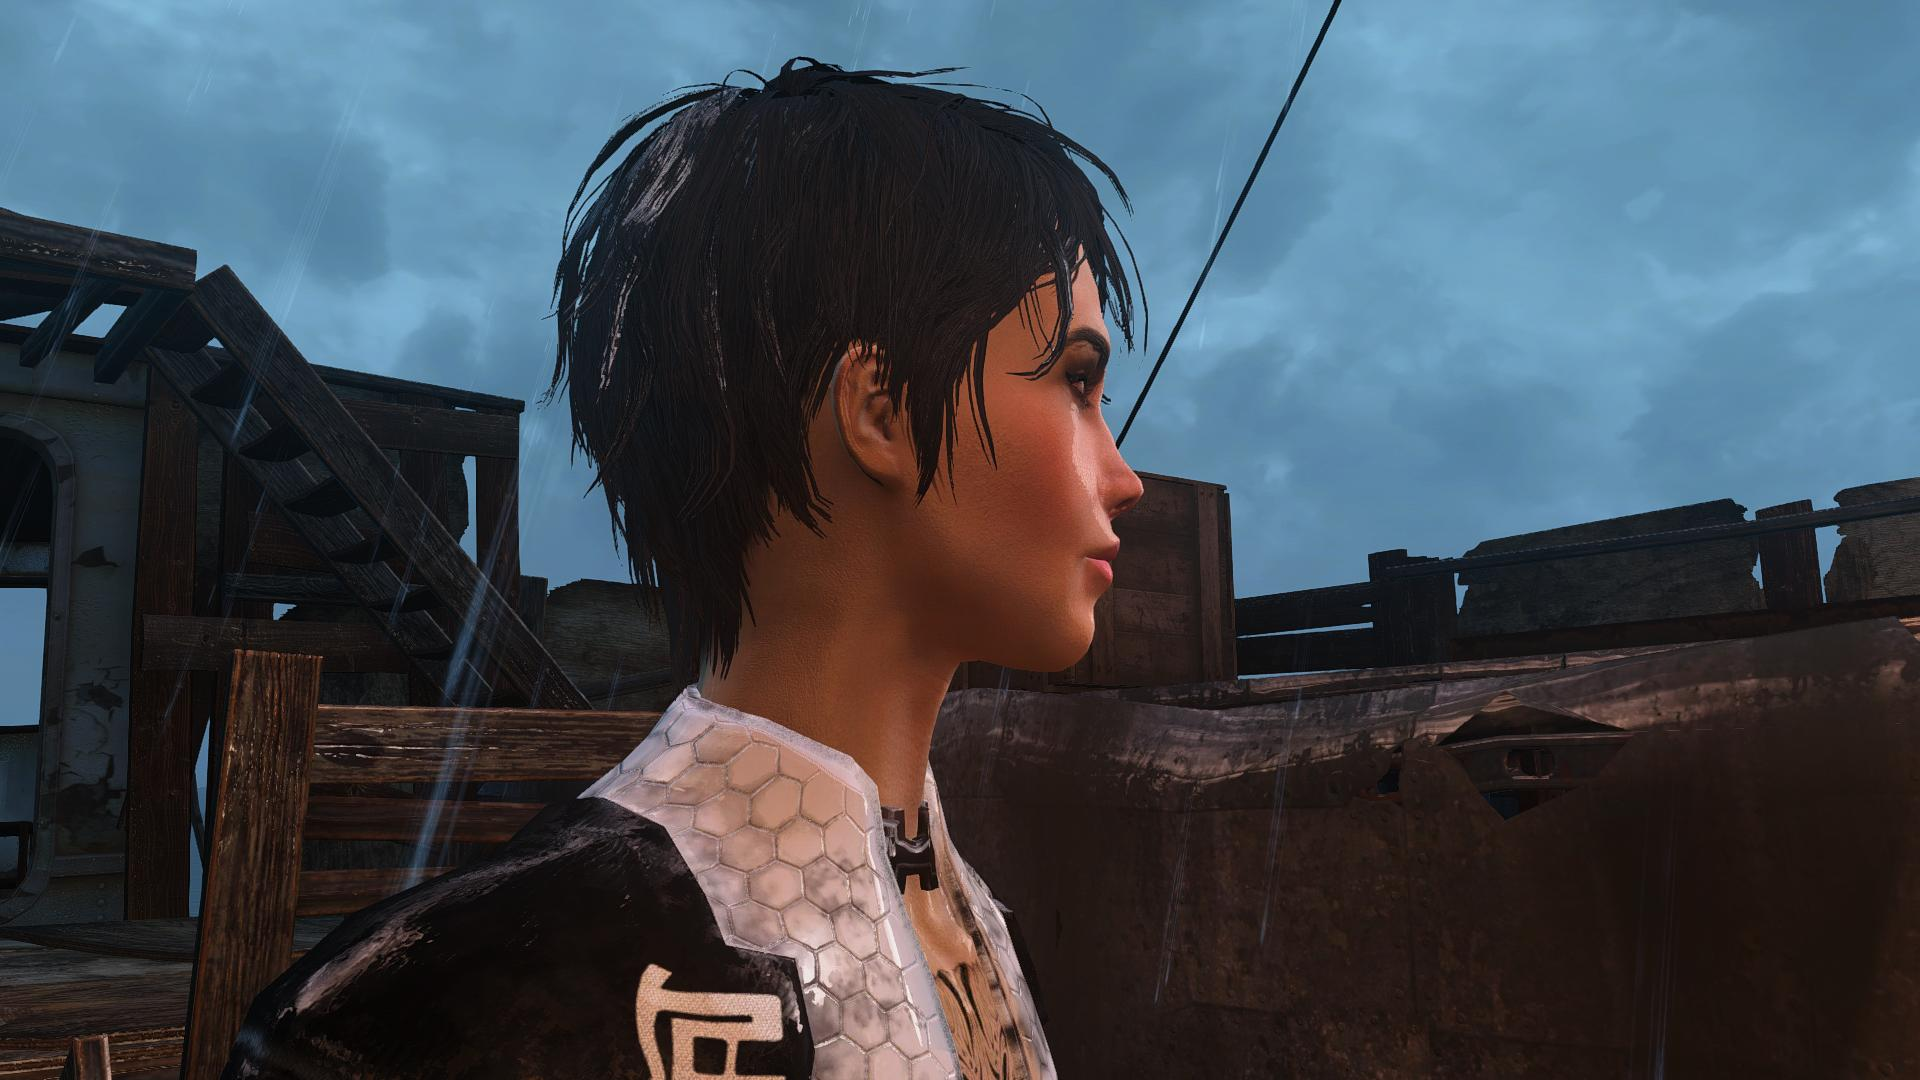 000511.Jpg - Fallout 4